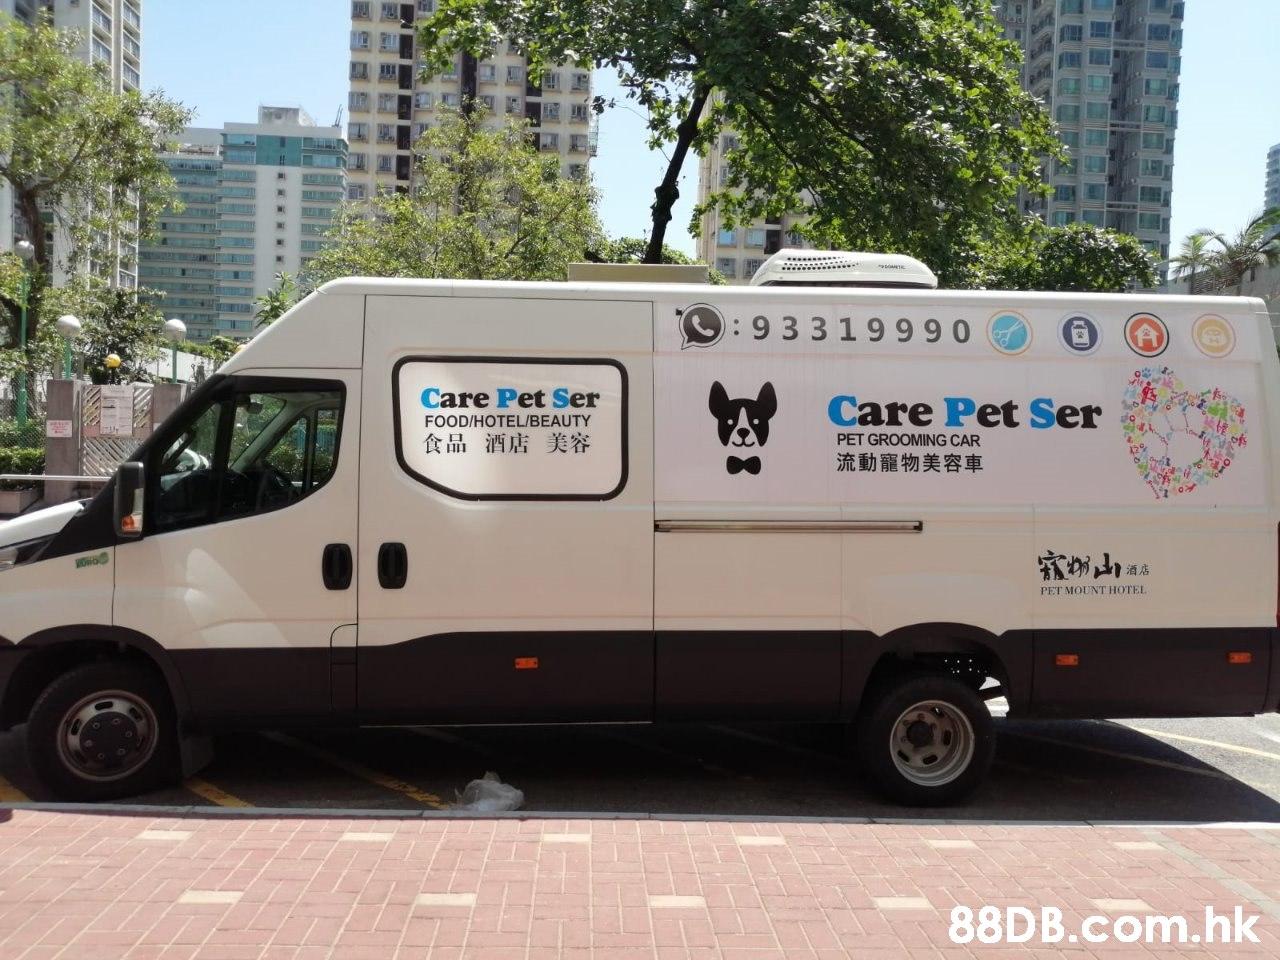 :93319990 Care Pet Ser Care Pet Ser FOOD/HOTEL/BEAUTY 食品 酒店美容 PET GROOMING CAR 流動寵物美容車 酒店 PET MOUNT HOTEL .hk  Vehicle,Car,Van,Transport,Motor vehicle